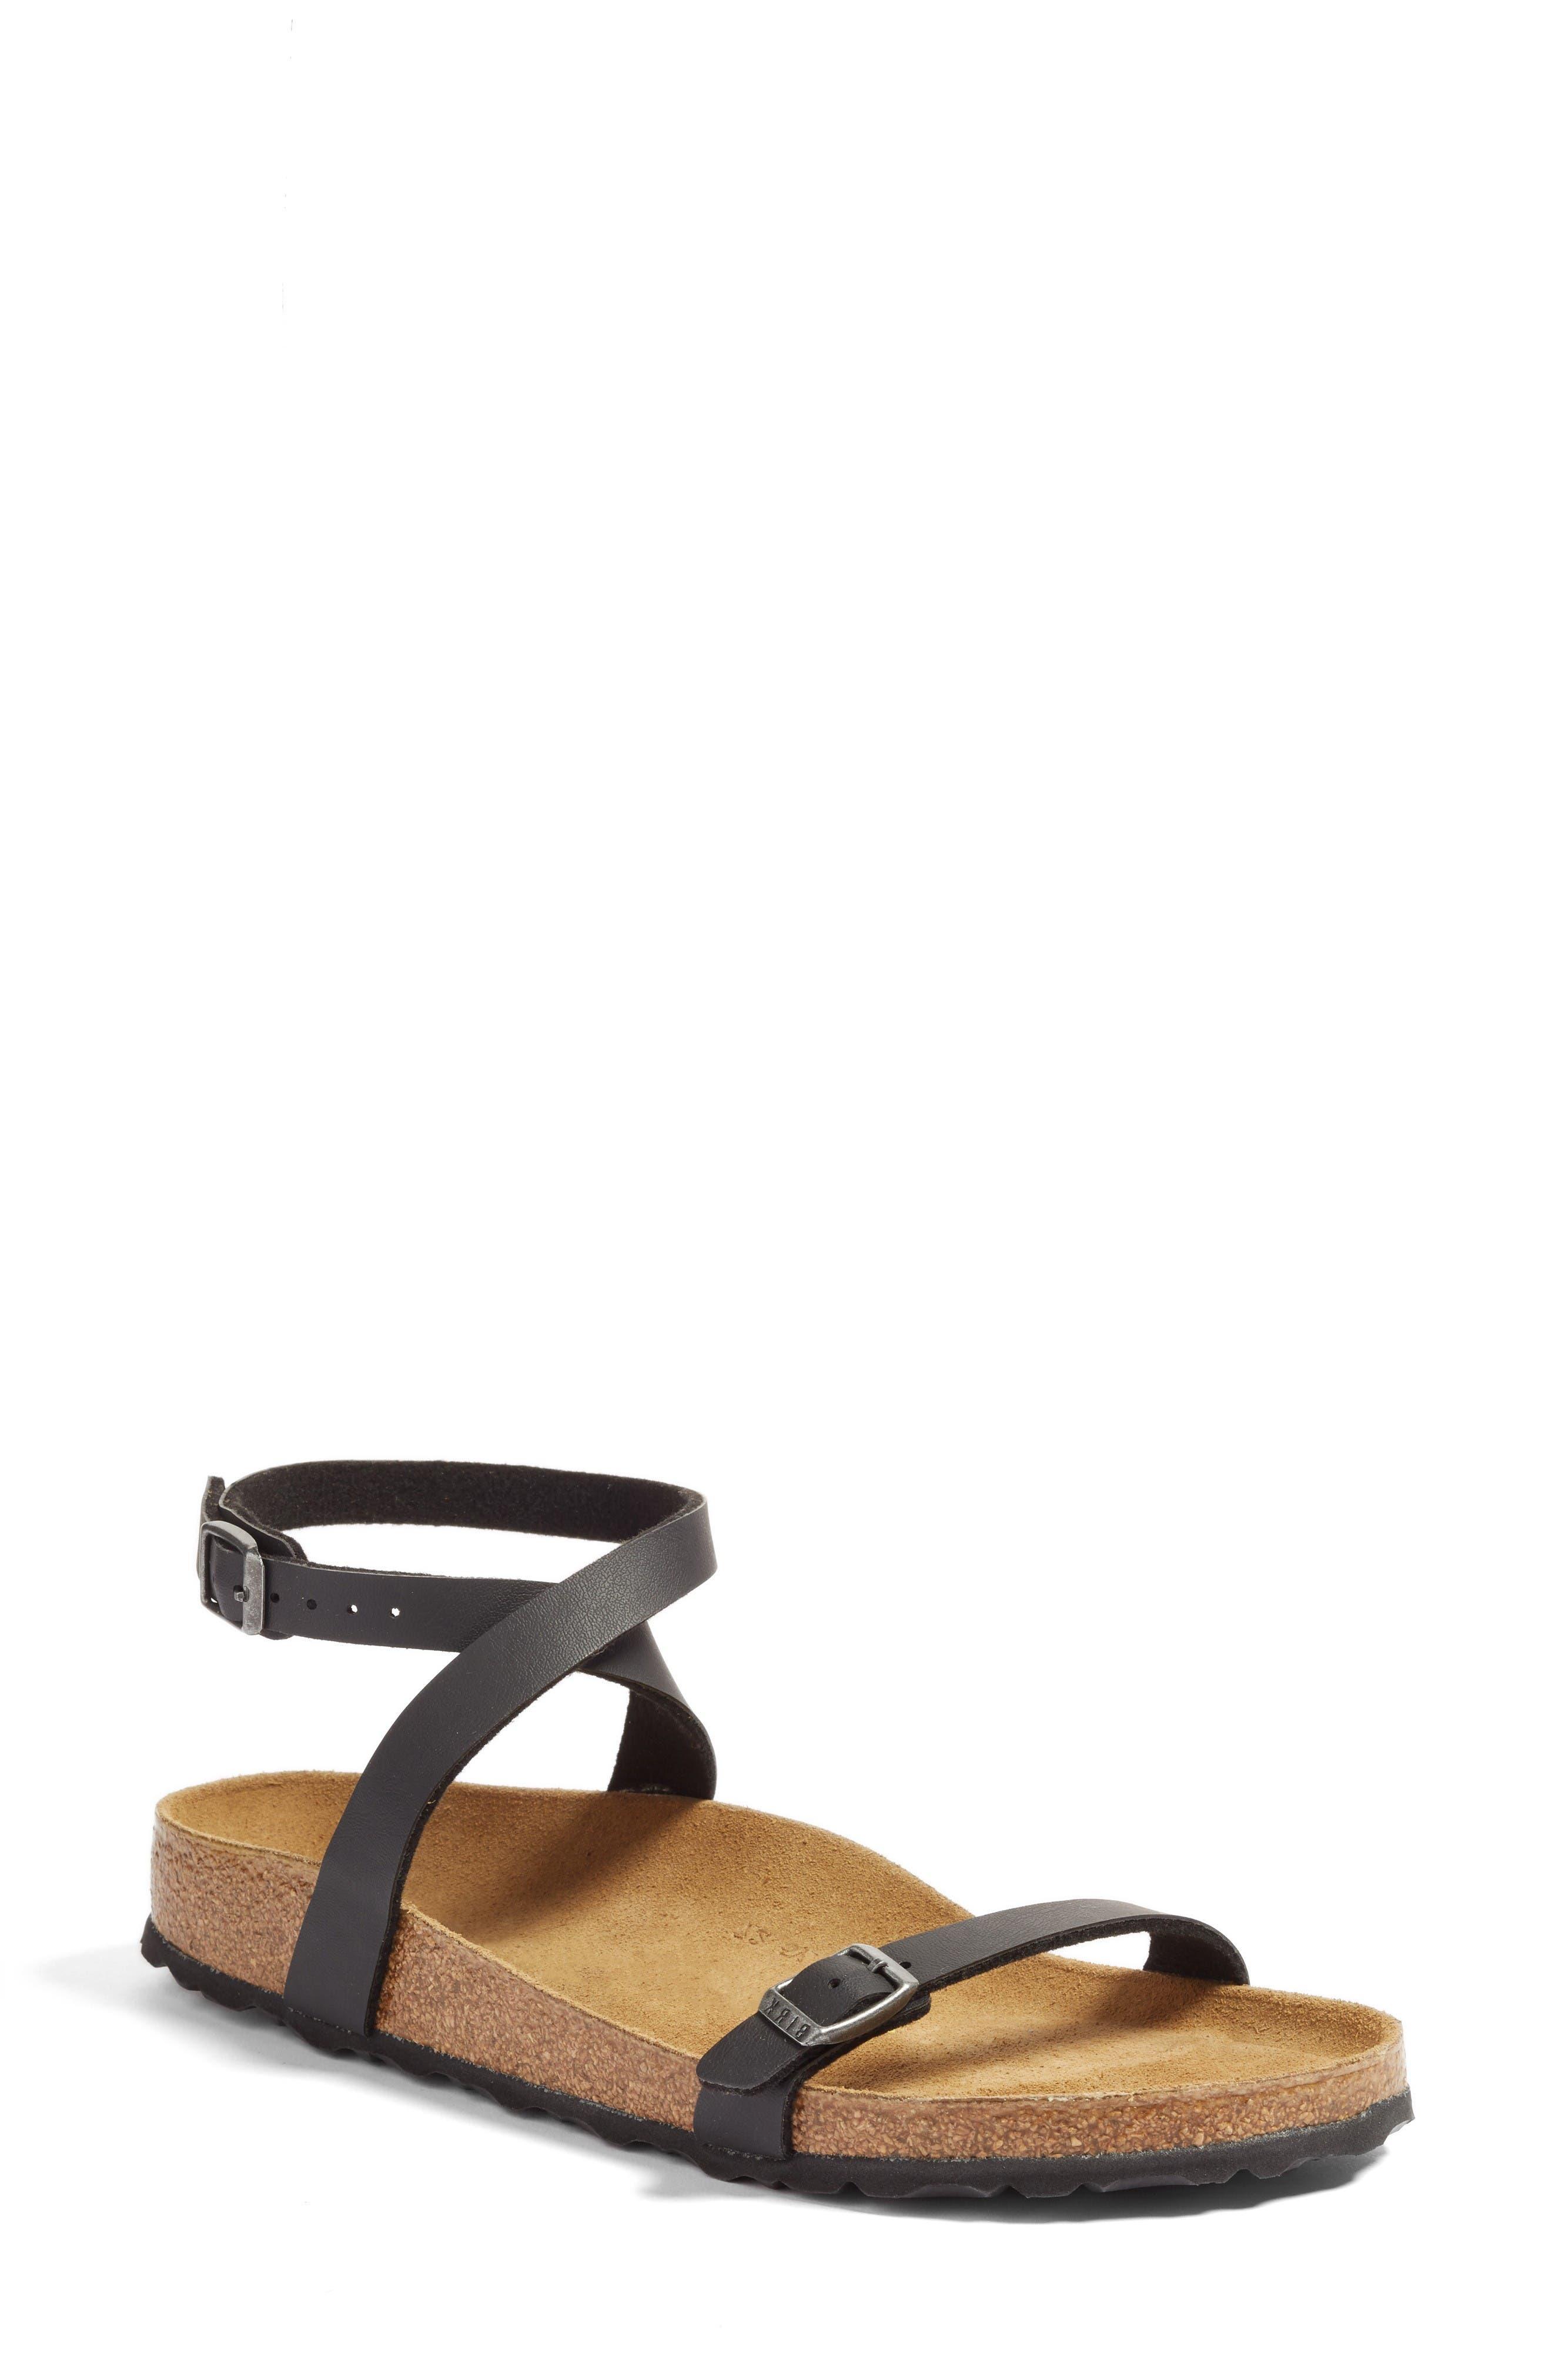 Daloa Ankle Strap Sandal,                         Main,                         color, Black